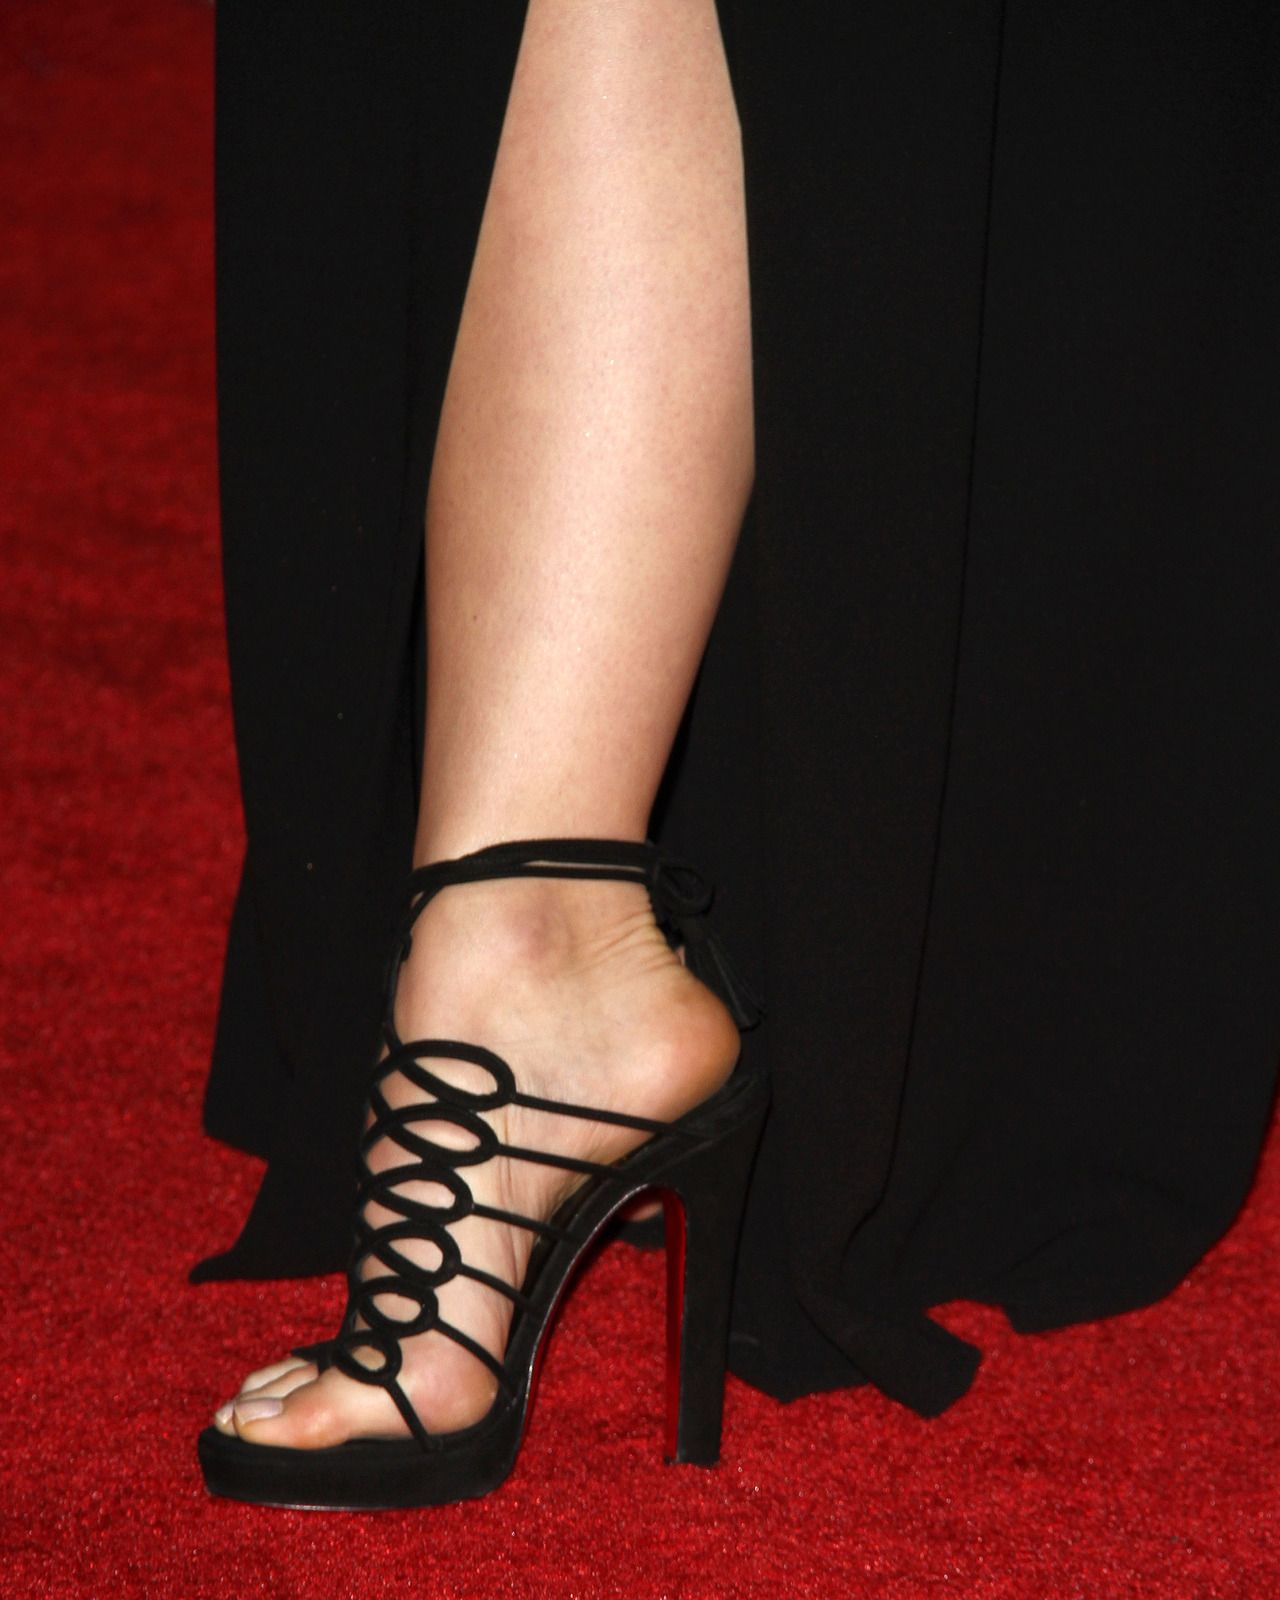 Christian Louboutin Black Leather Sandal